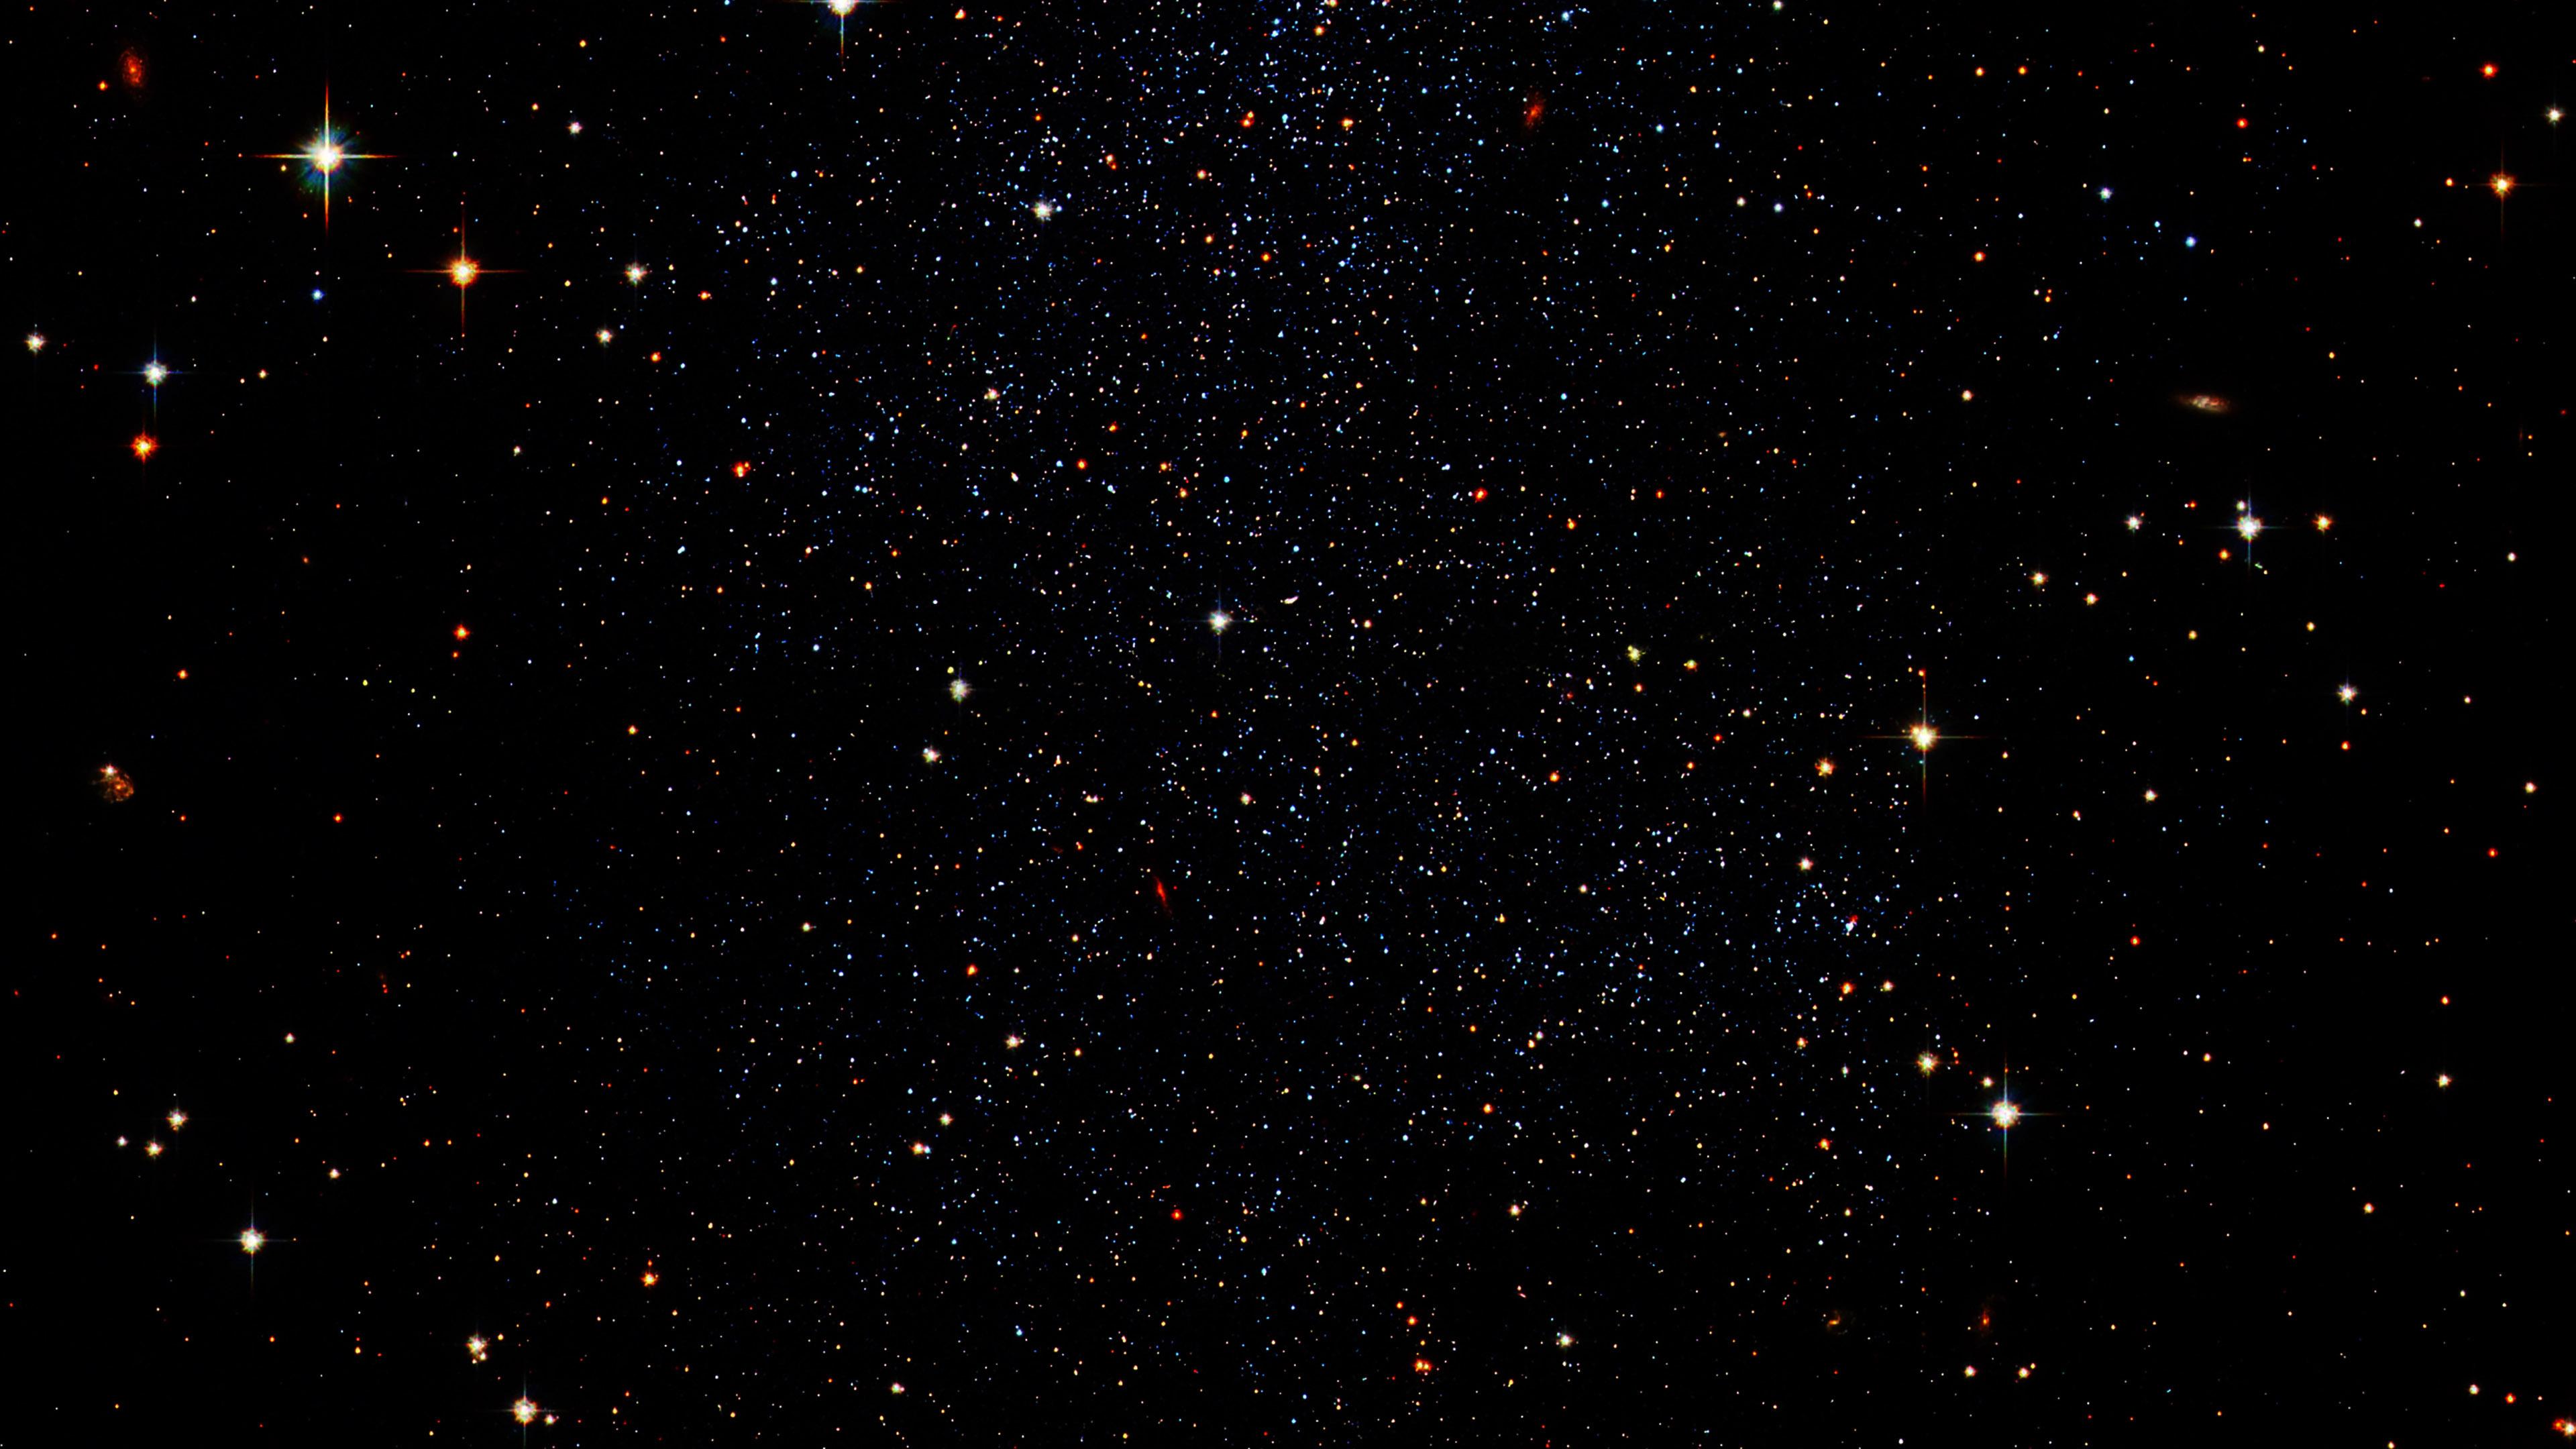 Md03-wallpaper-night-space-night-sagittarius-stars